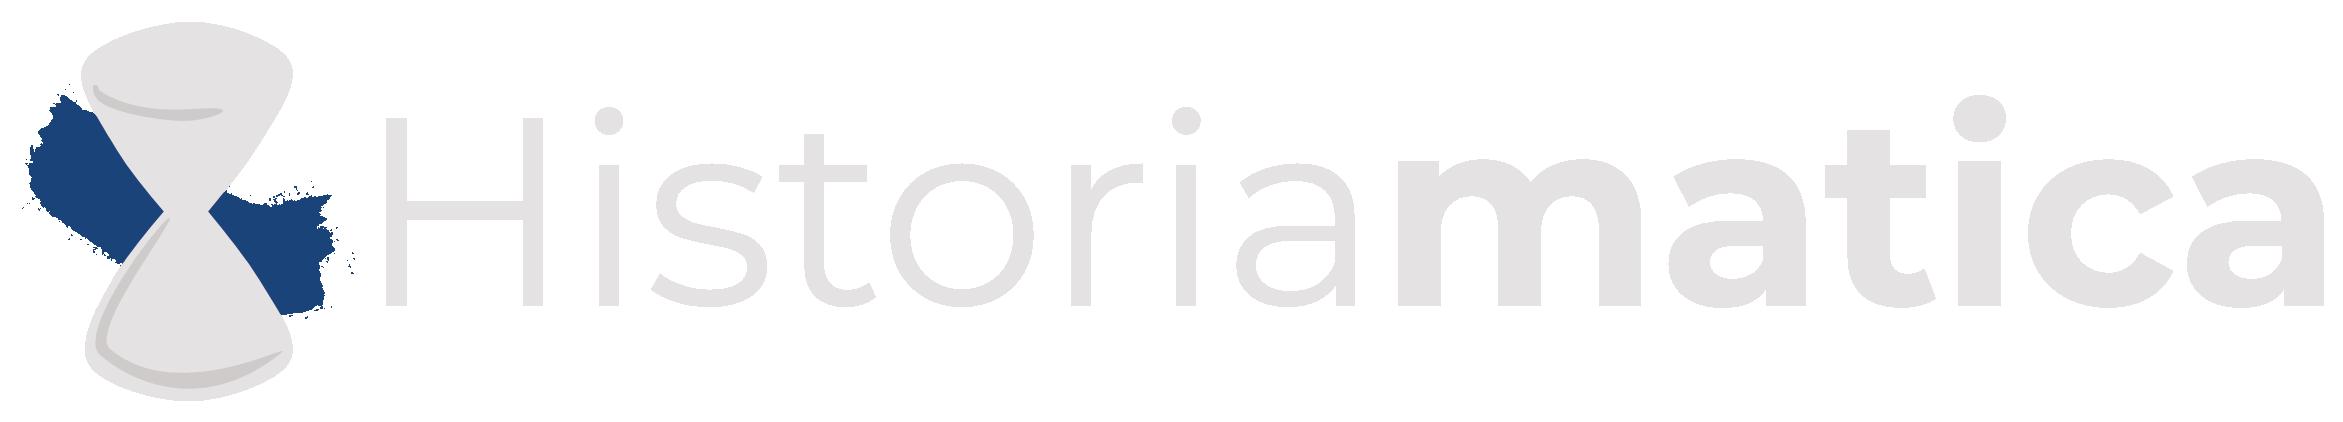 https://rhus.historiamati.ca/wp-content/uploads/2020/10/Historiamatica_LogoW_fit.png